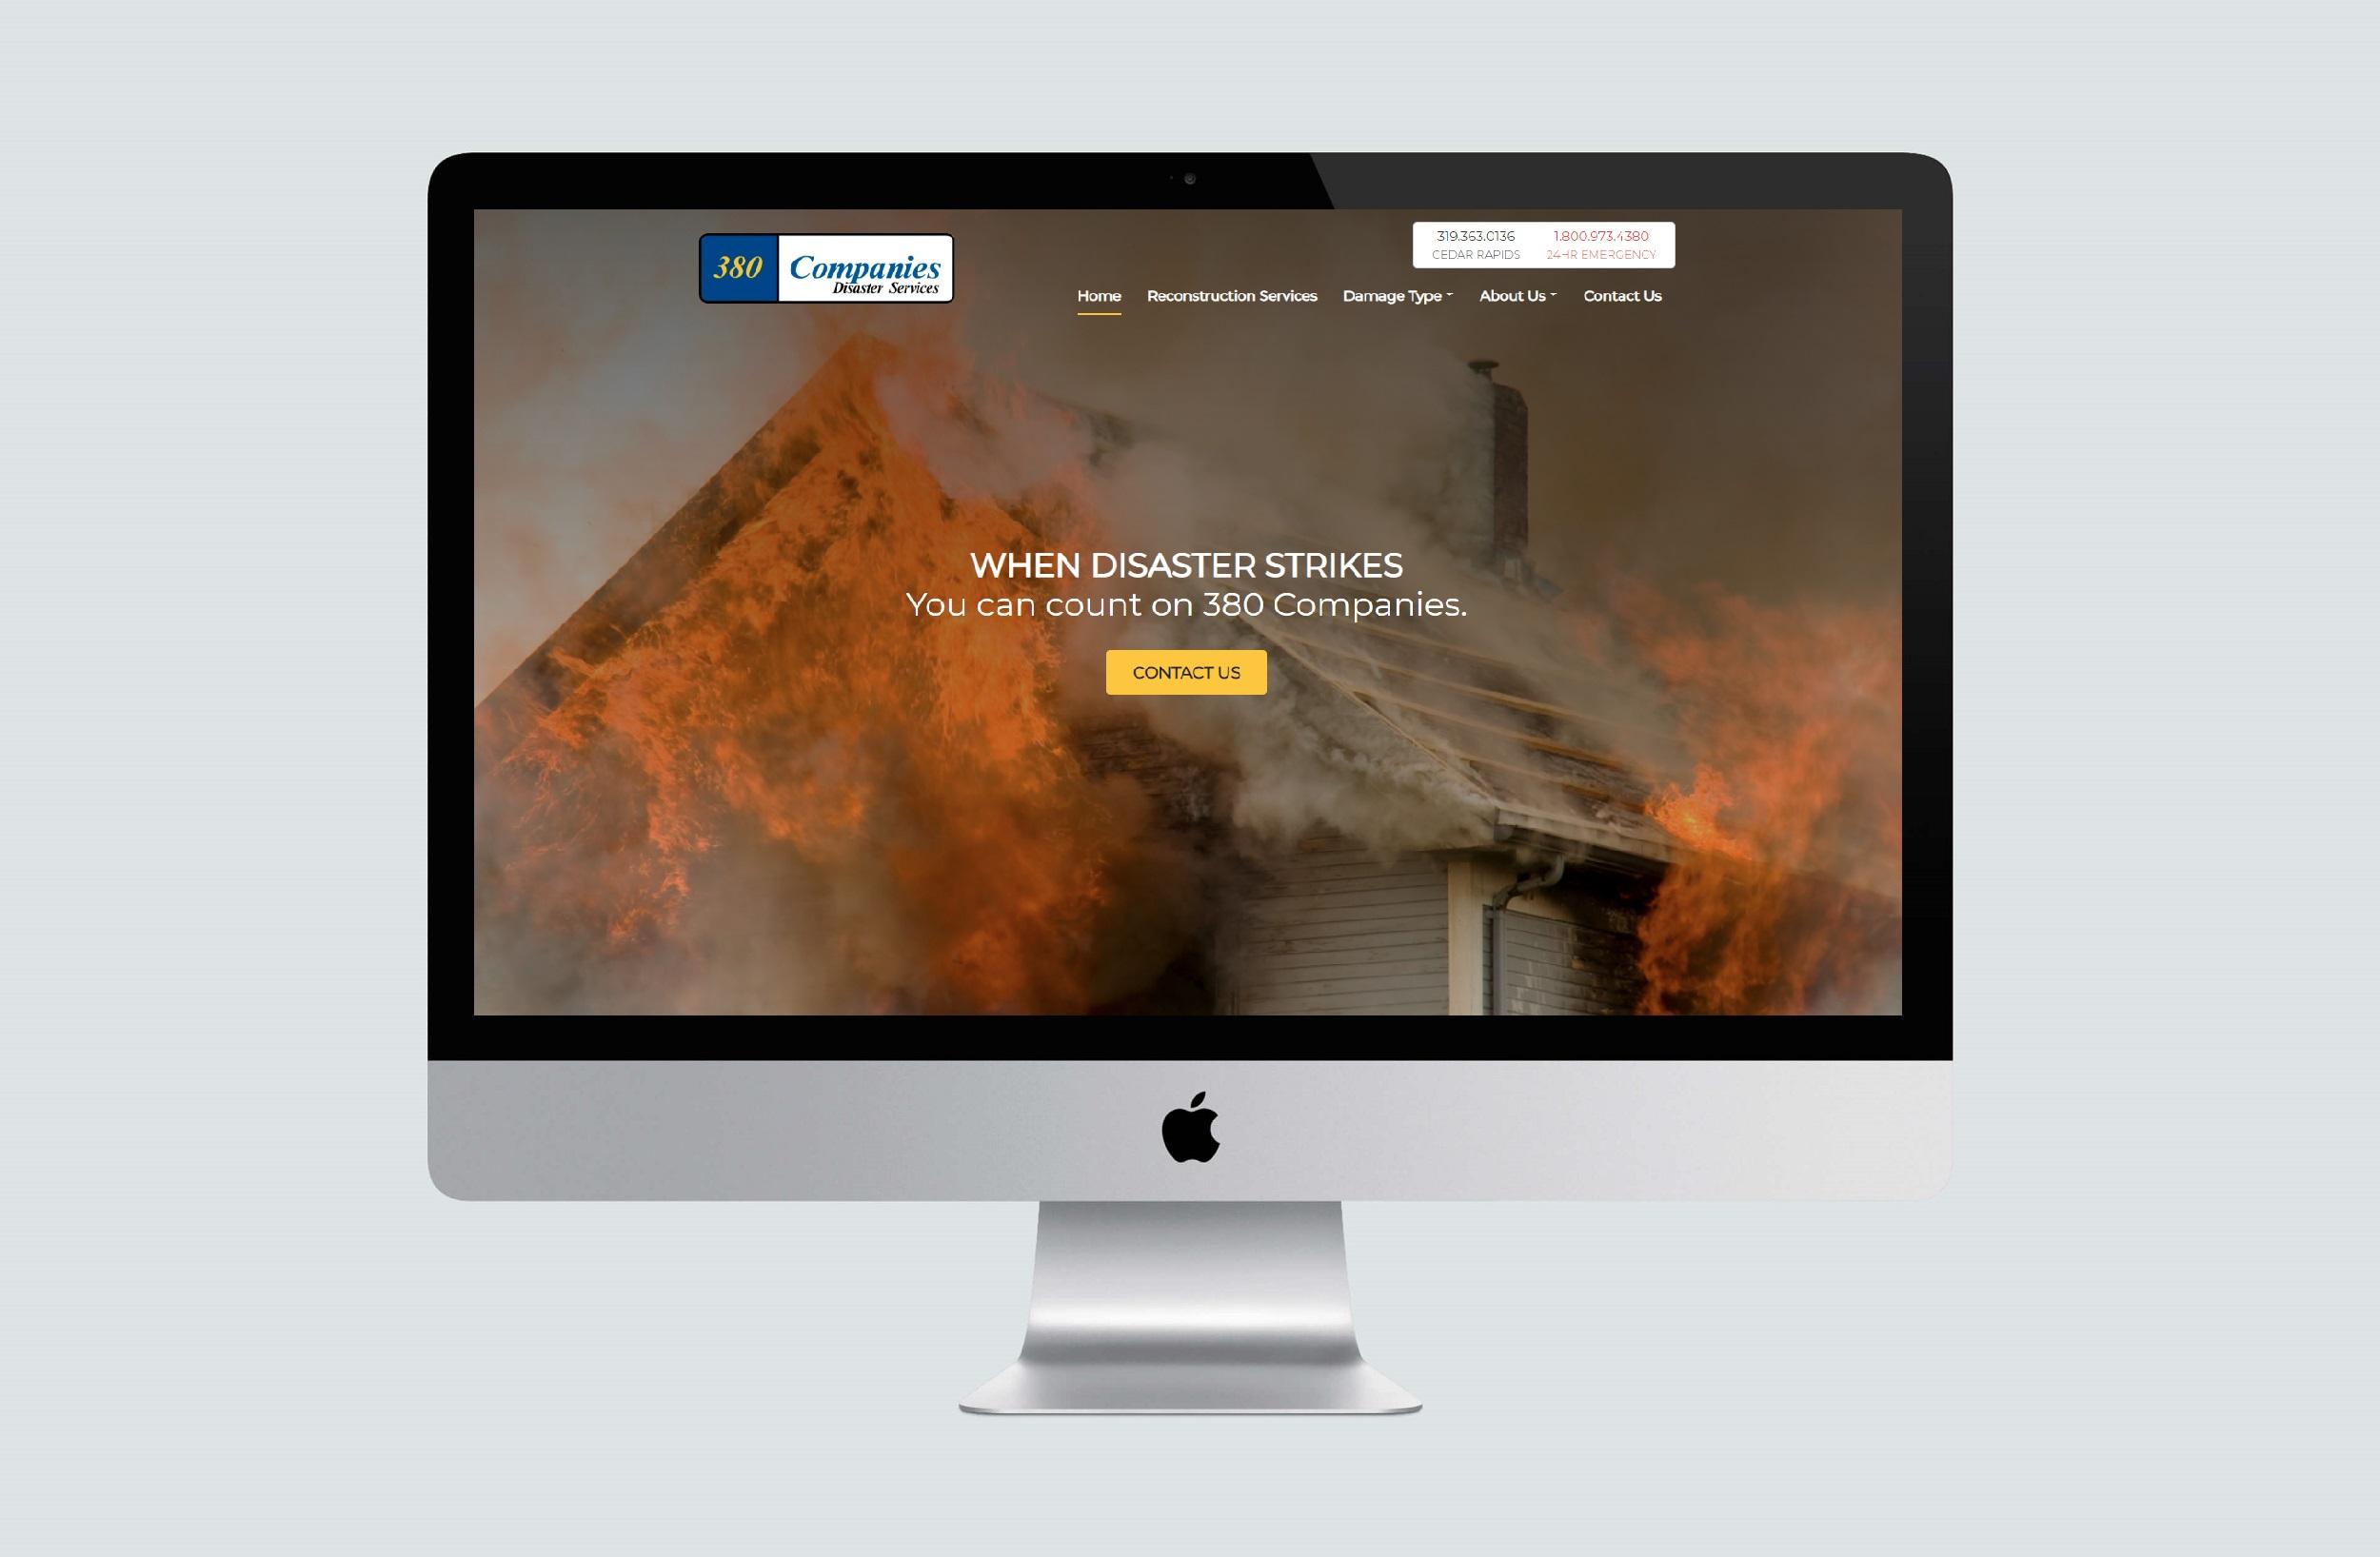 380 Companies website